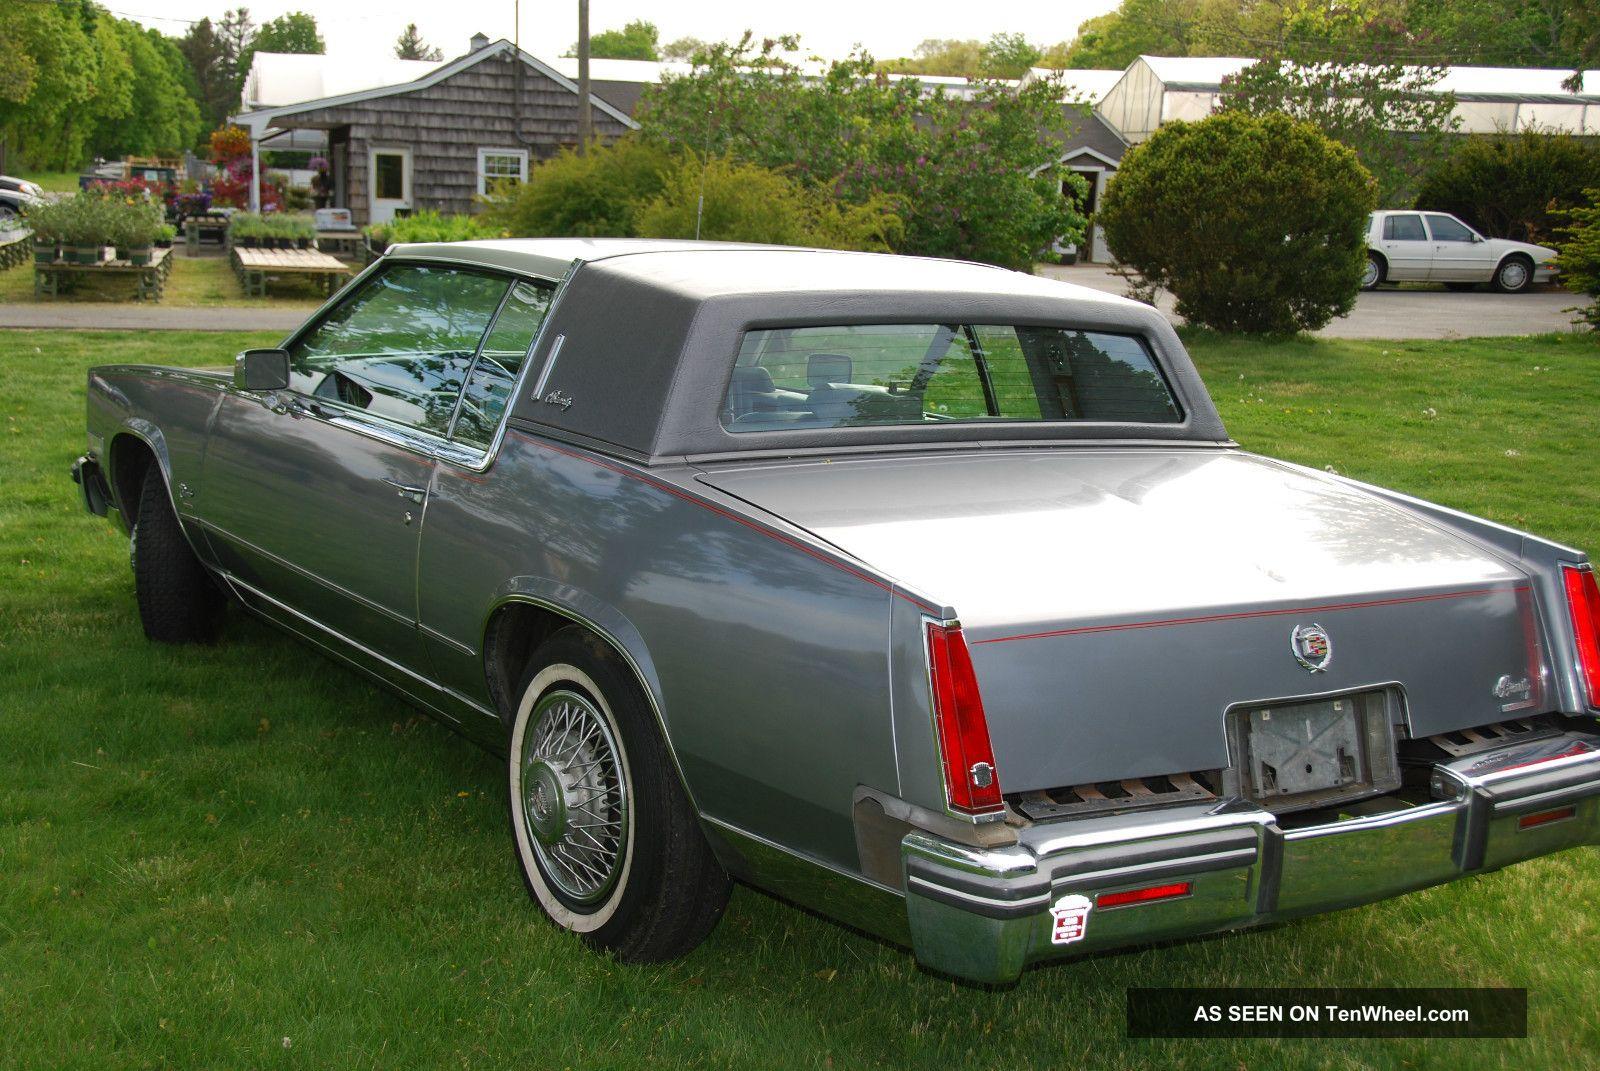 1980 Cadillac Eldorado Biarritz Coupe 2 - Door 5. 7l Rare